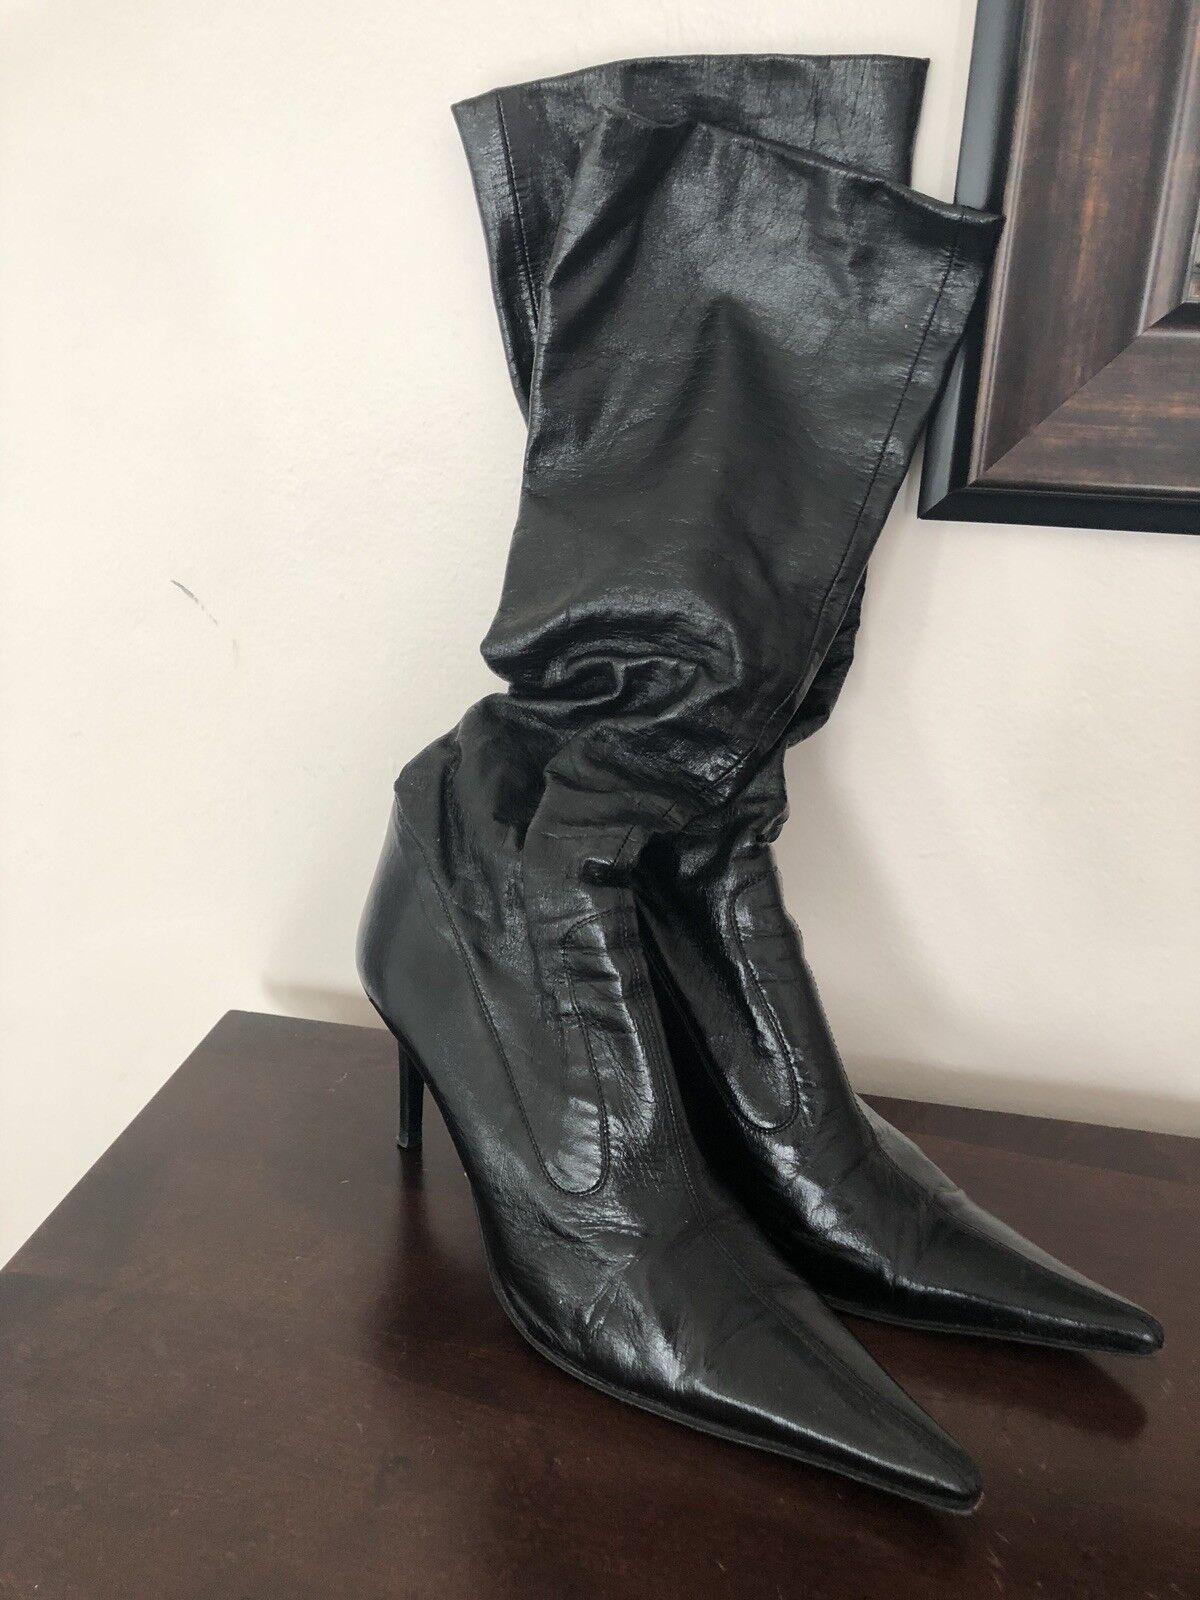 Barneys New York Noir Bottes en cuir, 38,5